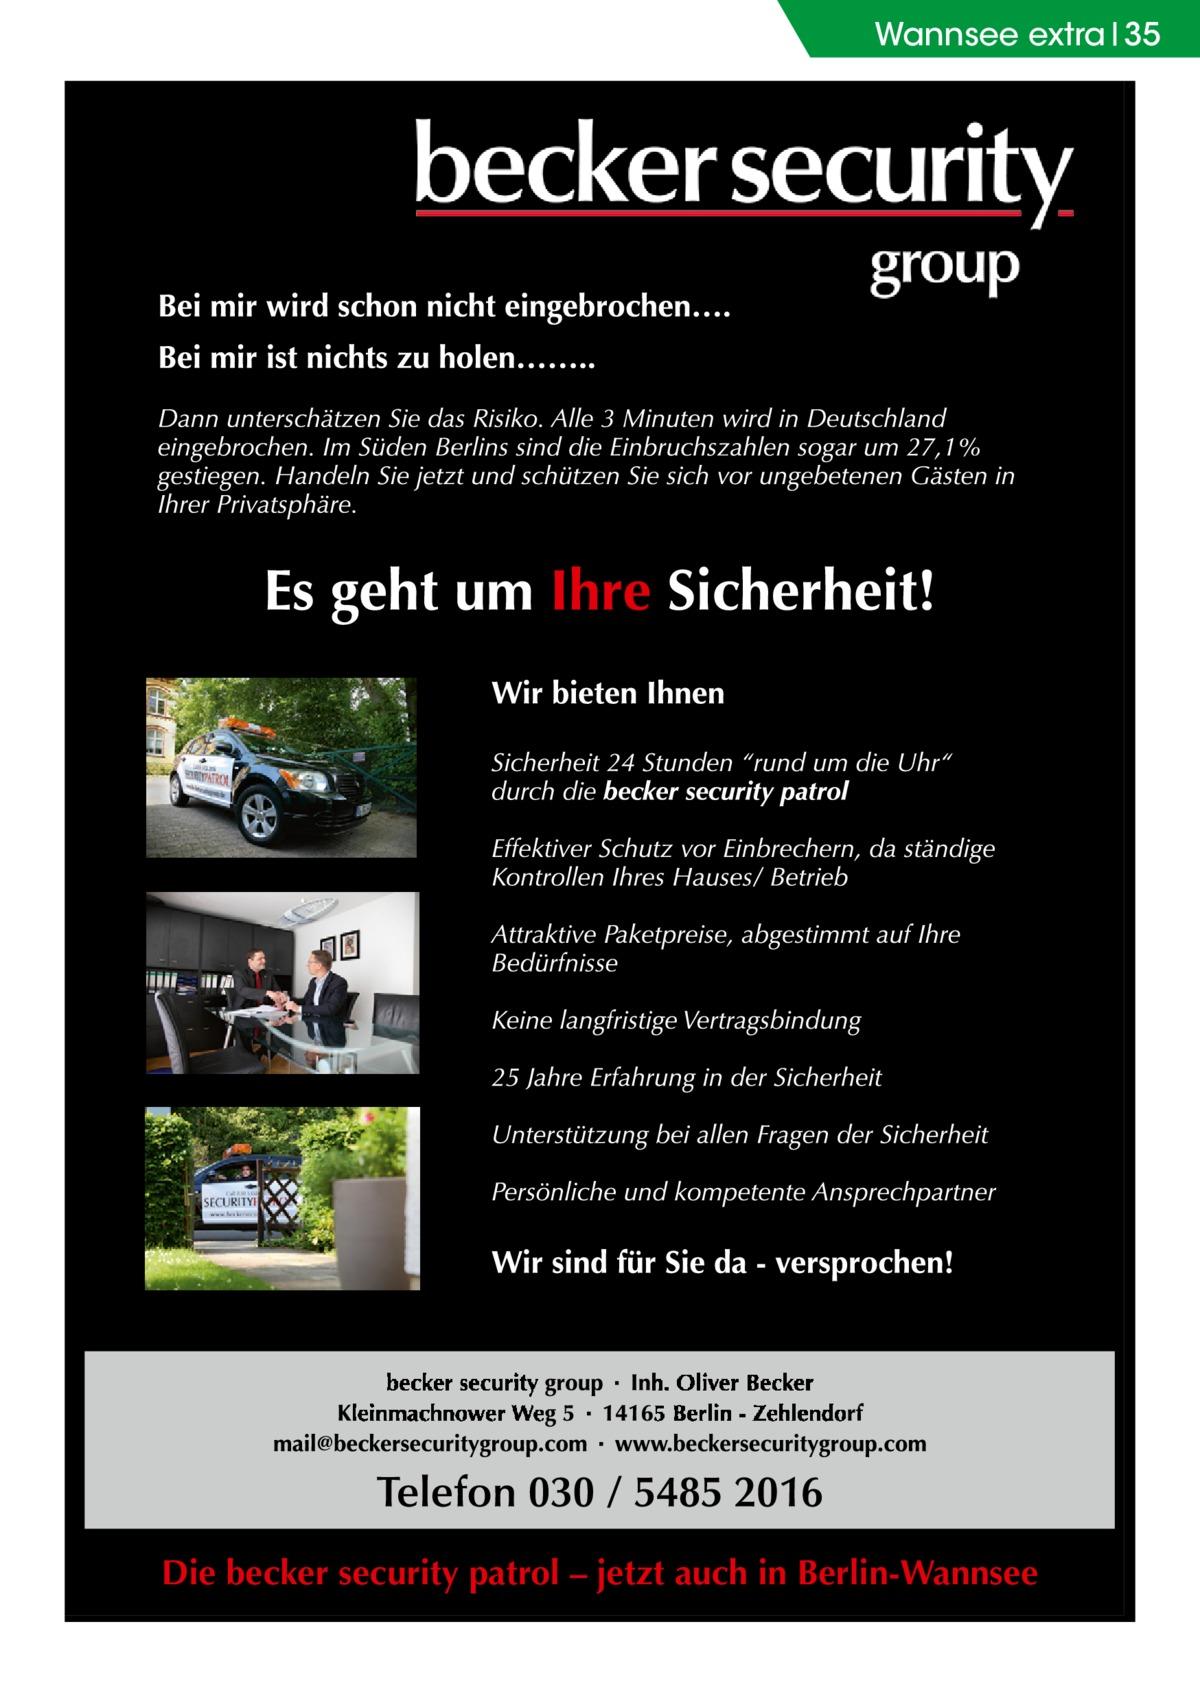 Wannsee extra 35  Die becker security patrol – jetzt auch in Berlin-Wannsee